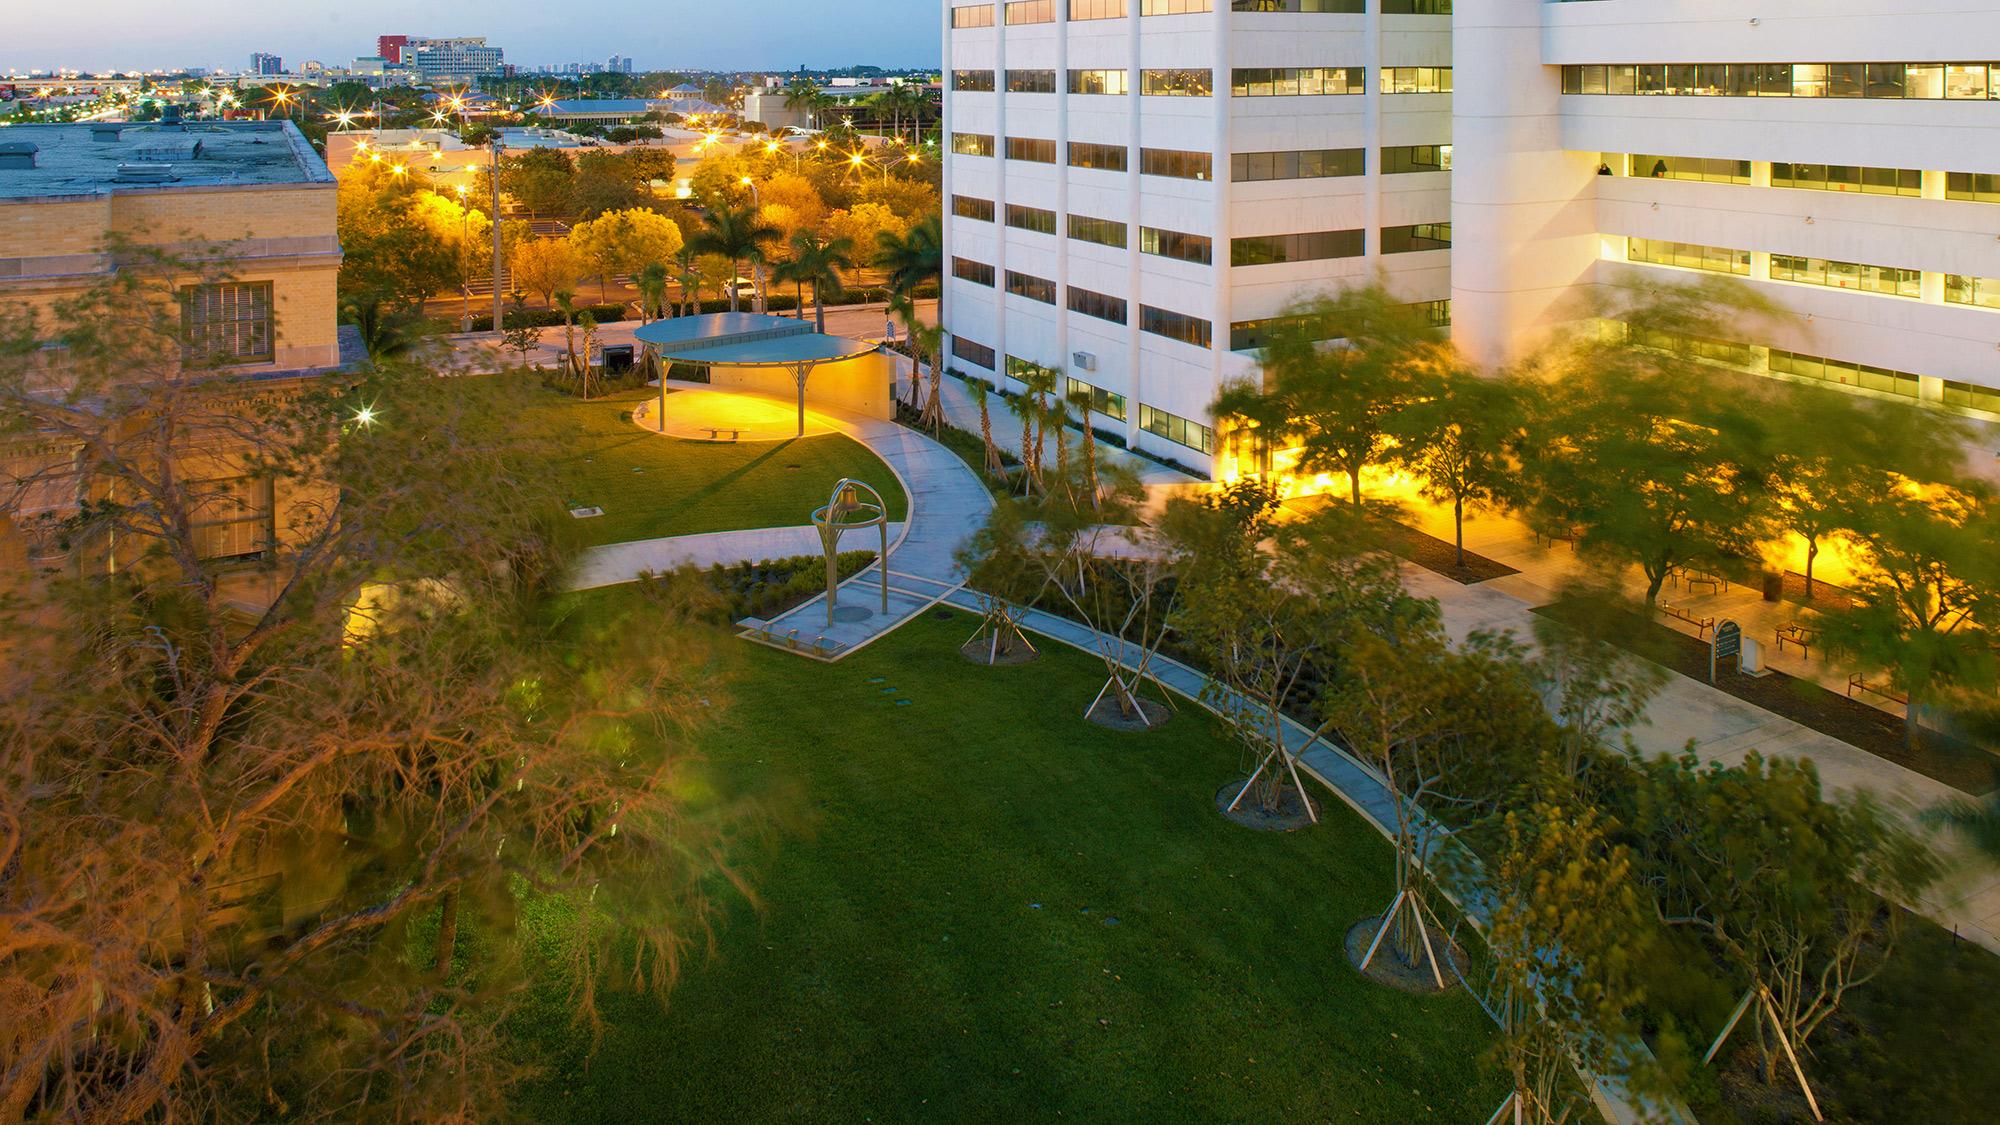 Barbara-Grygutis_The-Green-Wall_Palm-Beach-County-Assembly-Plaza-Florida_14.jpg